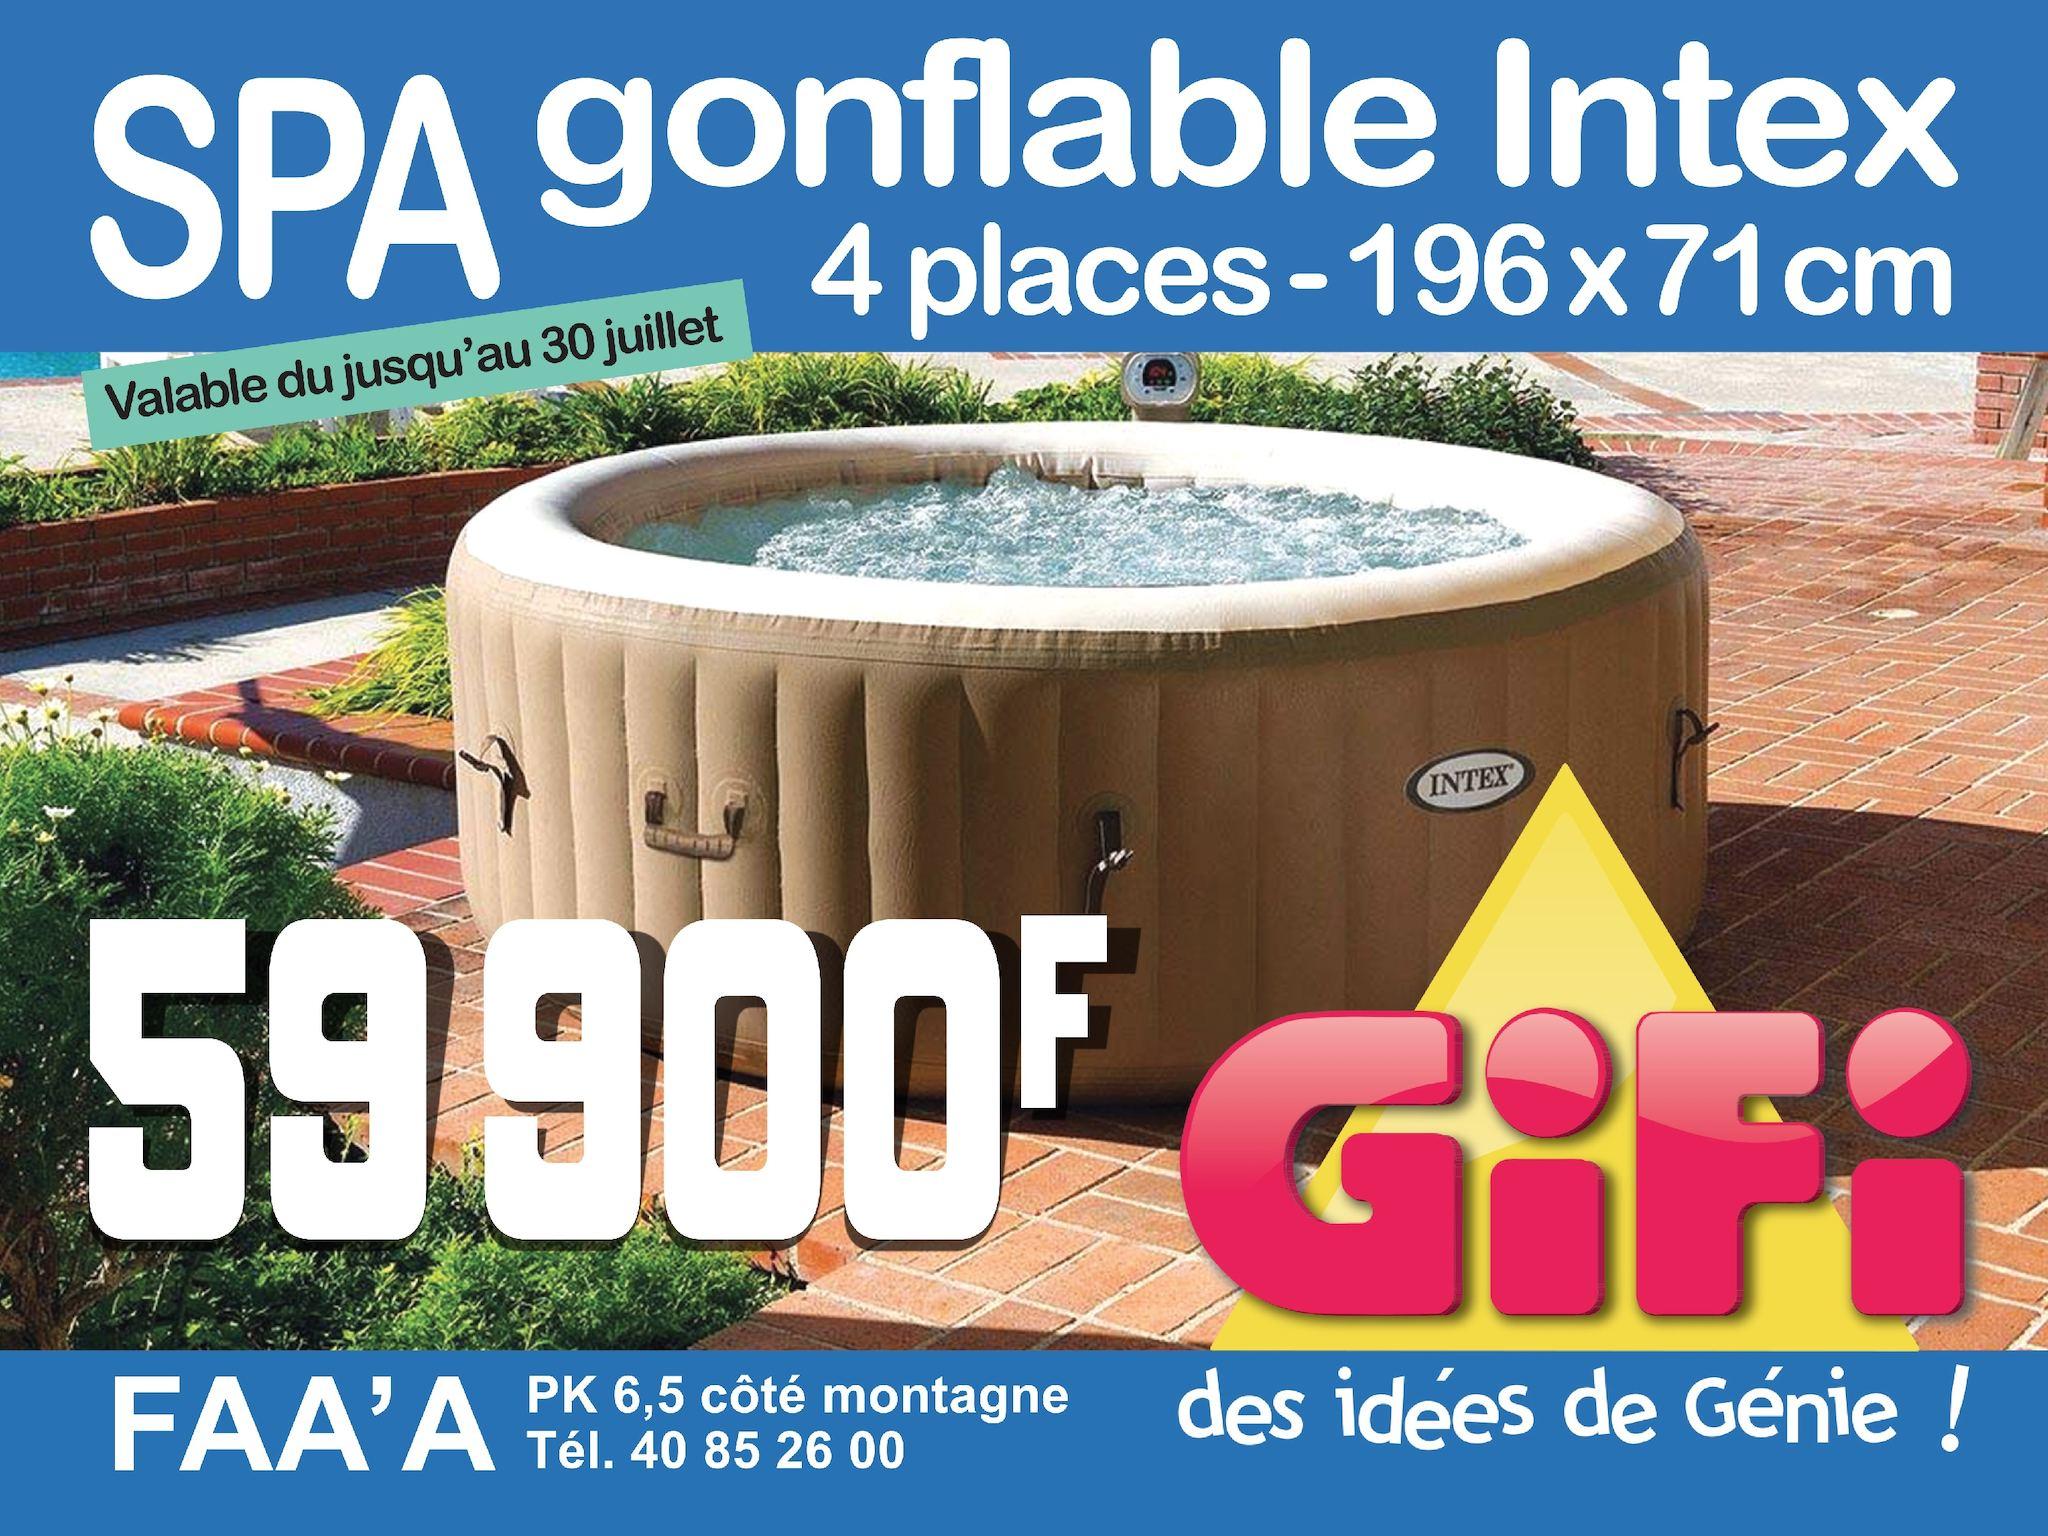 Calameo Gifi Spa Chauffant Intex